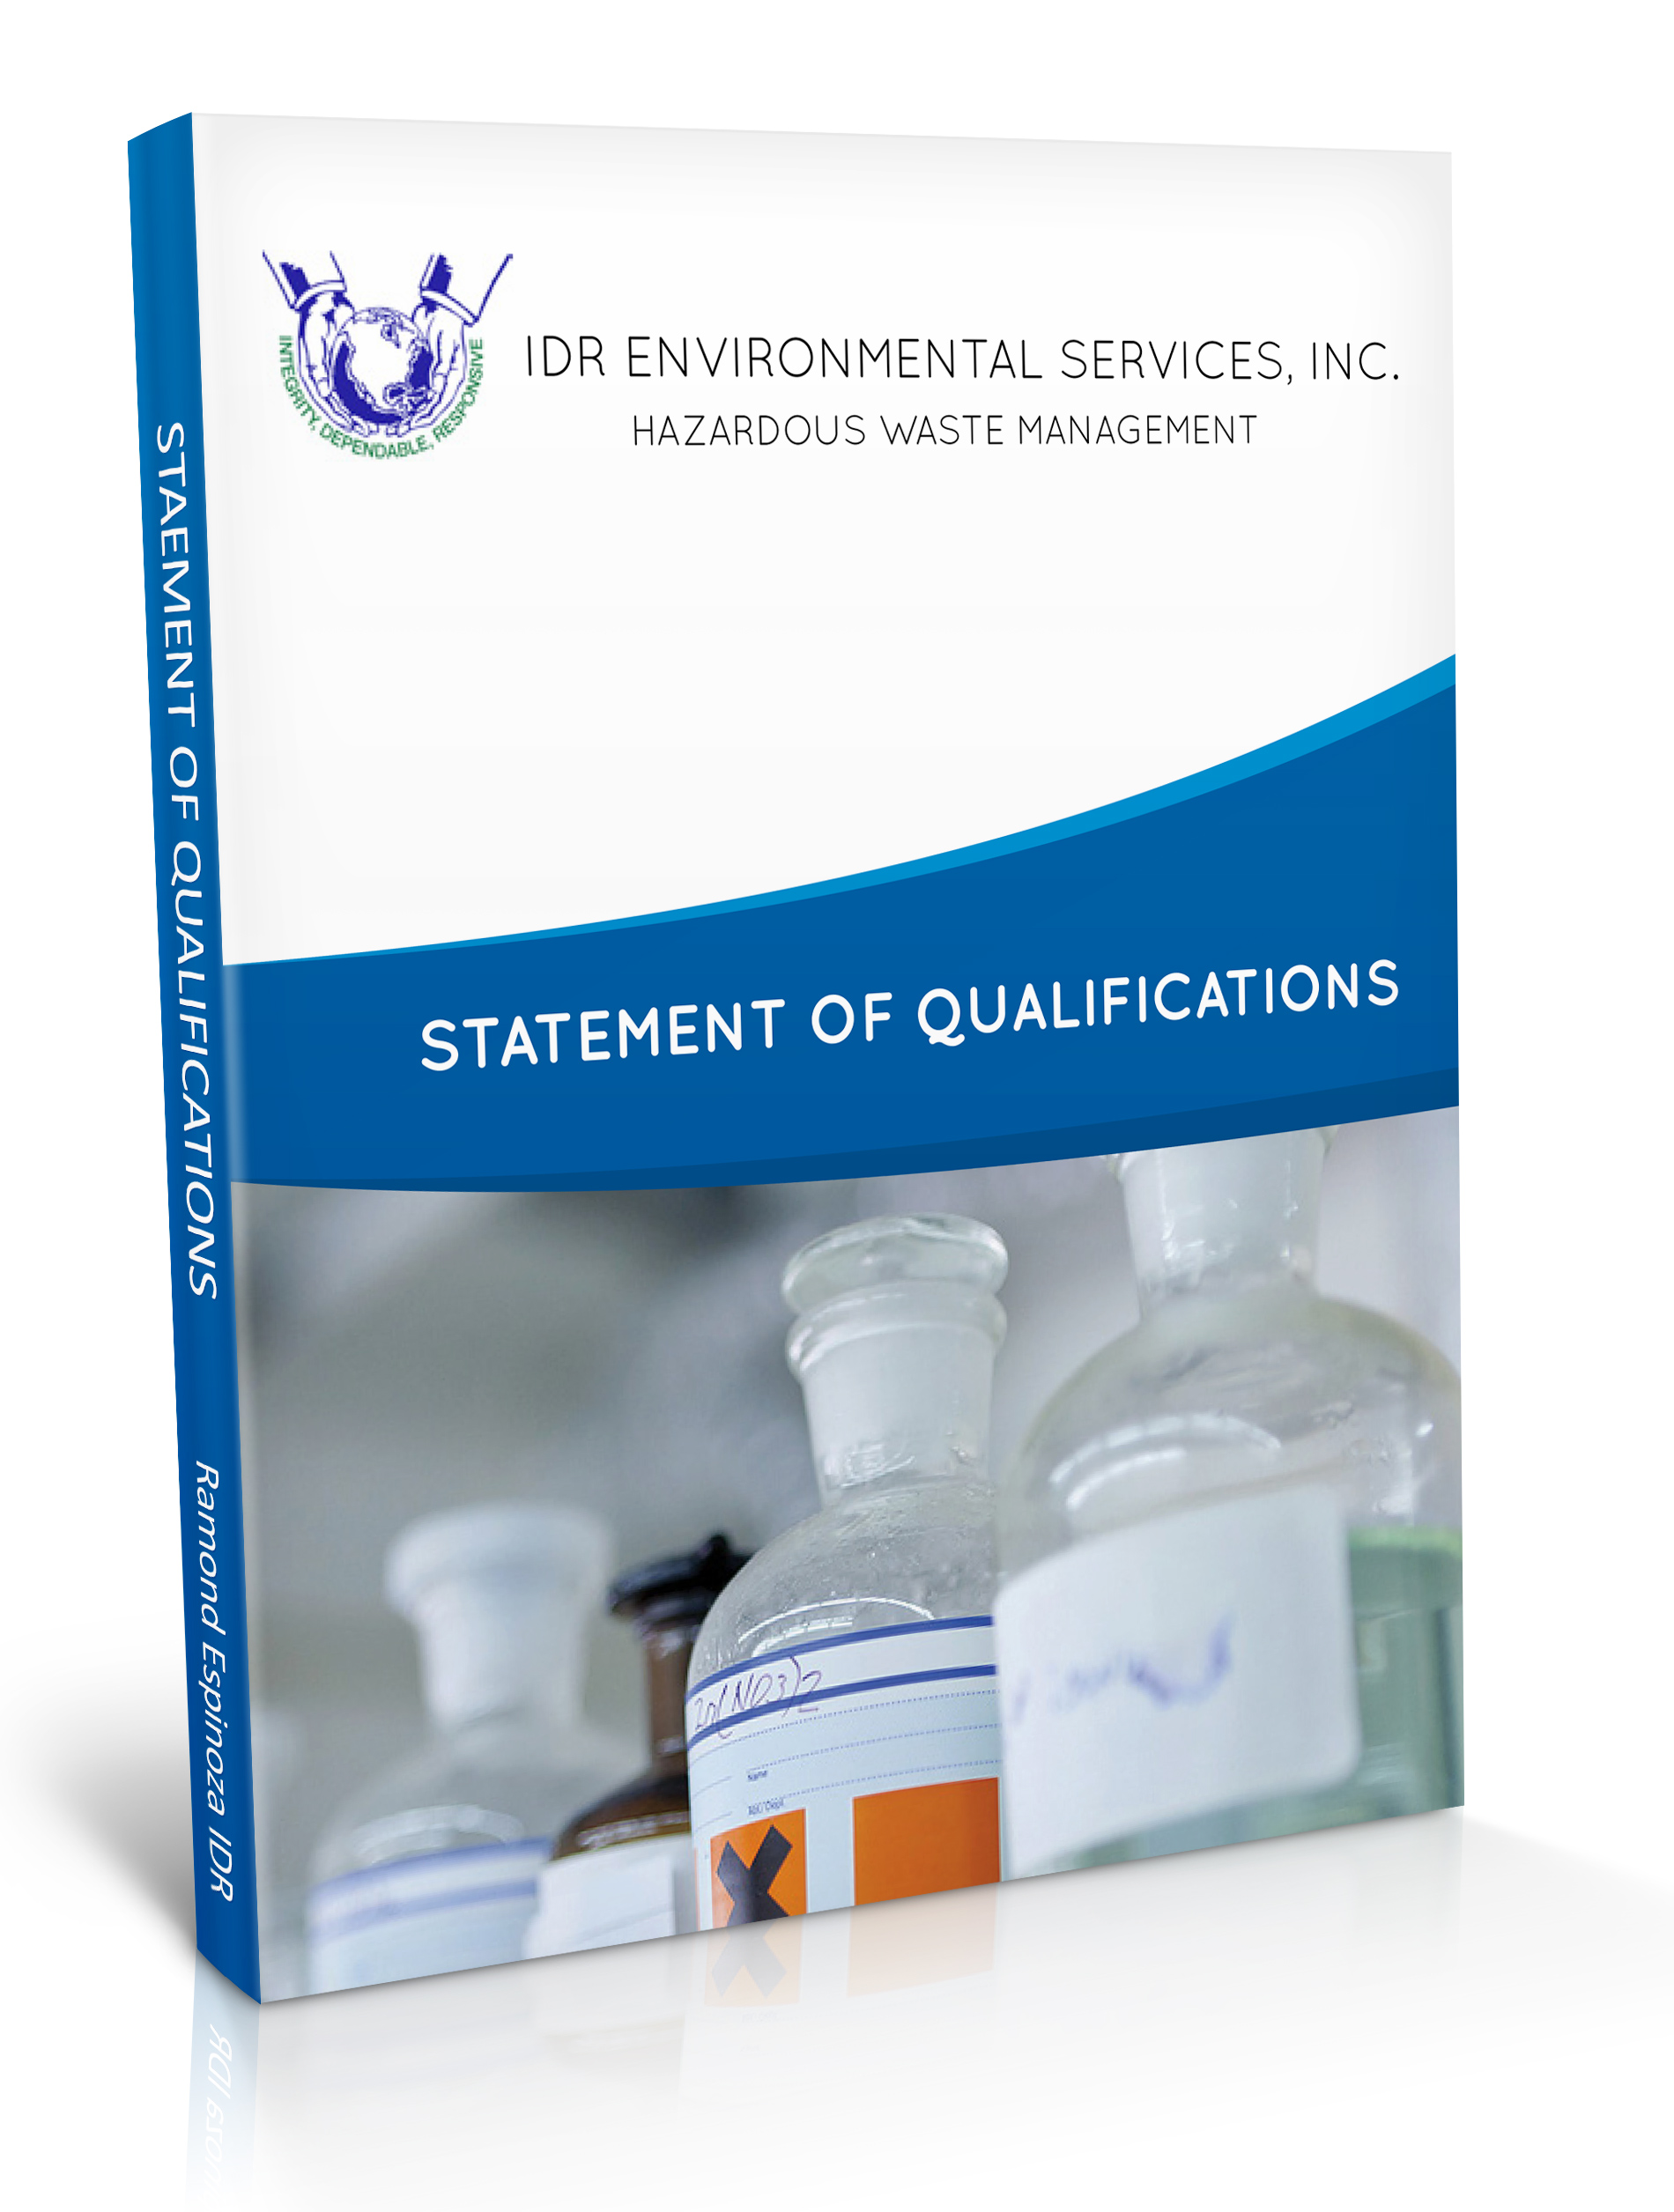 IDR Statement of Qualifications